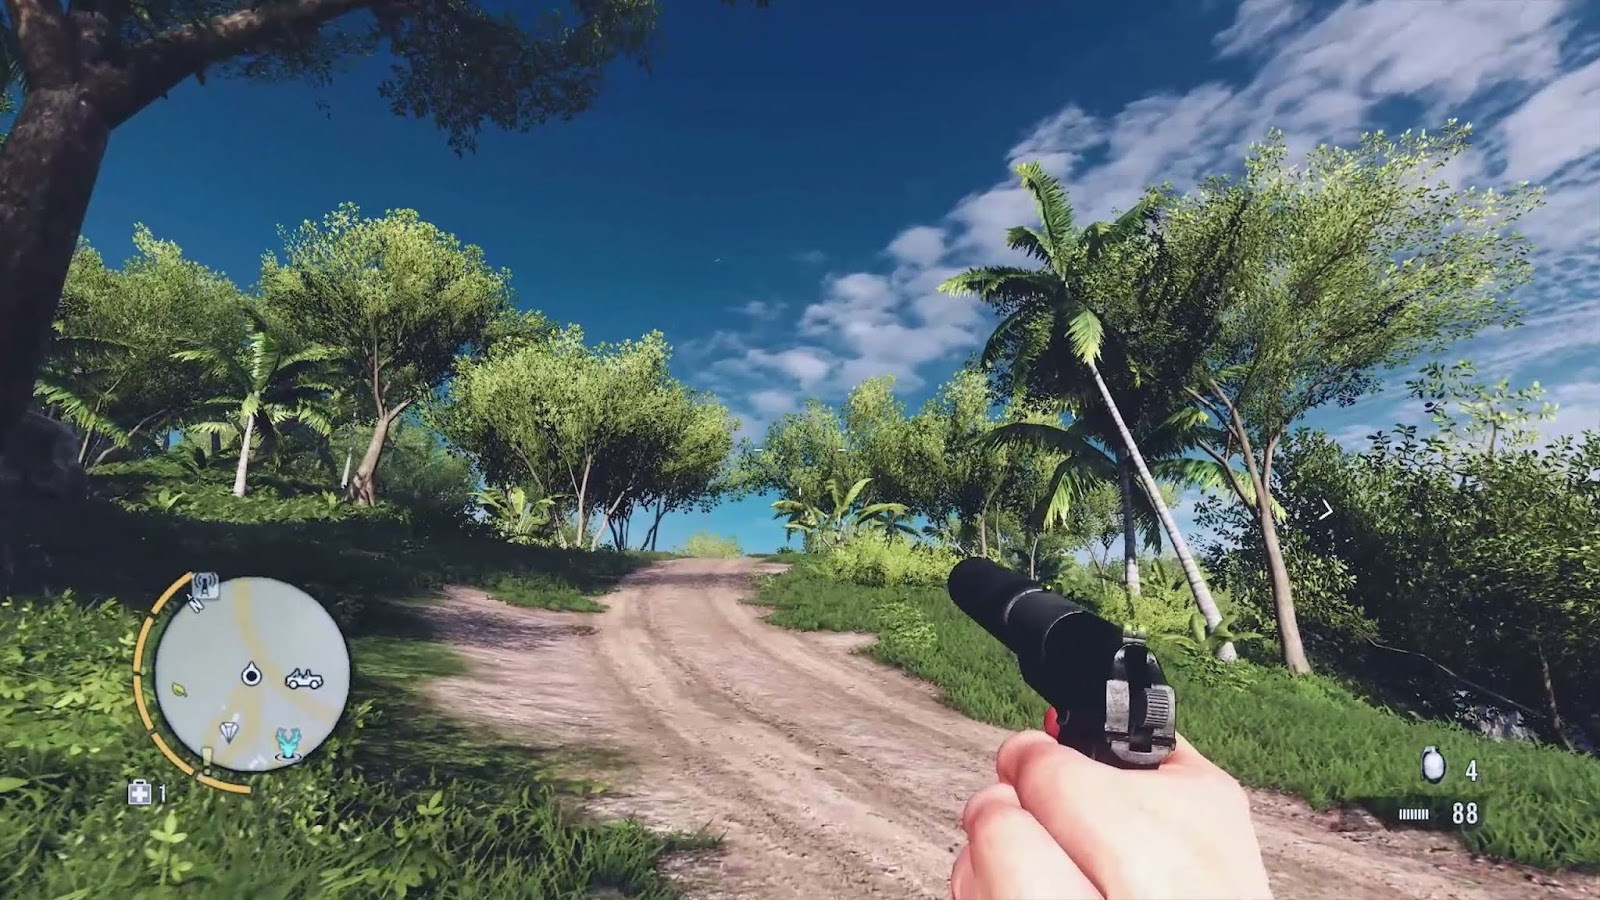 Far Cry 3 CryNation 2019 Graphics Mod FC3 Remastered Graphics Mod Texture + Lighting